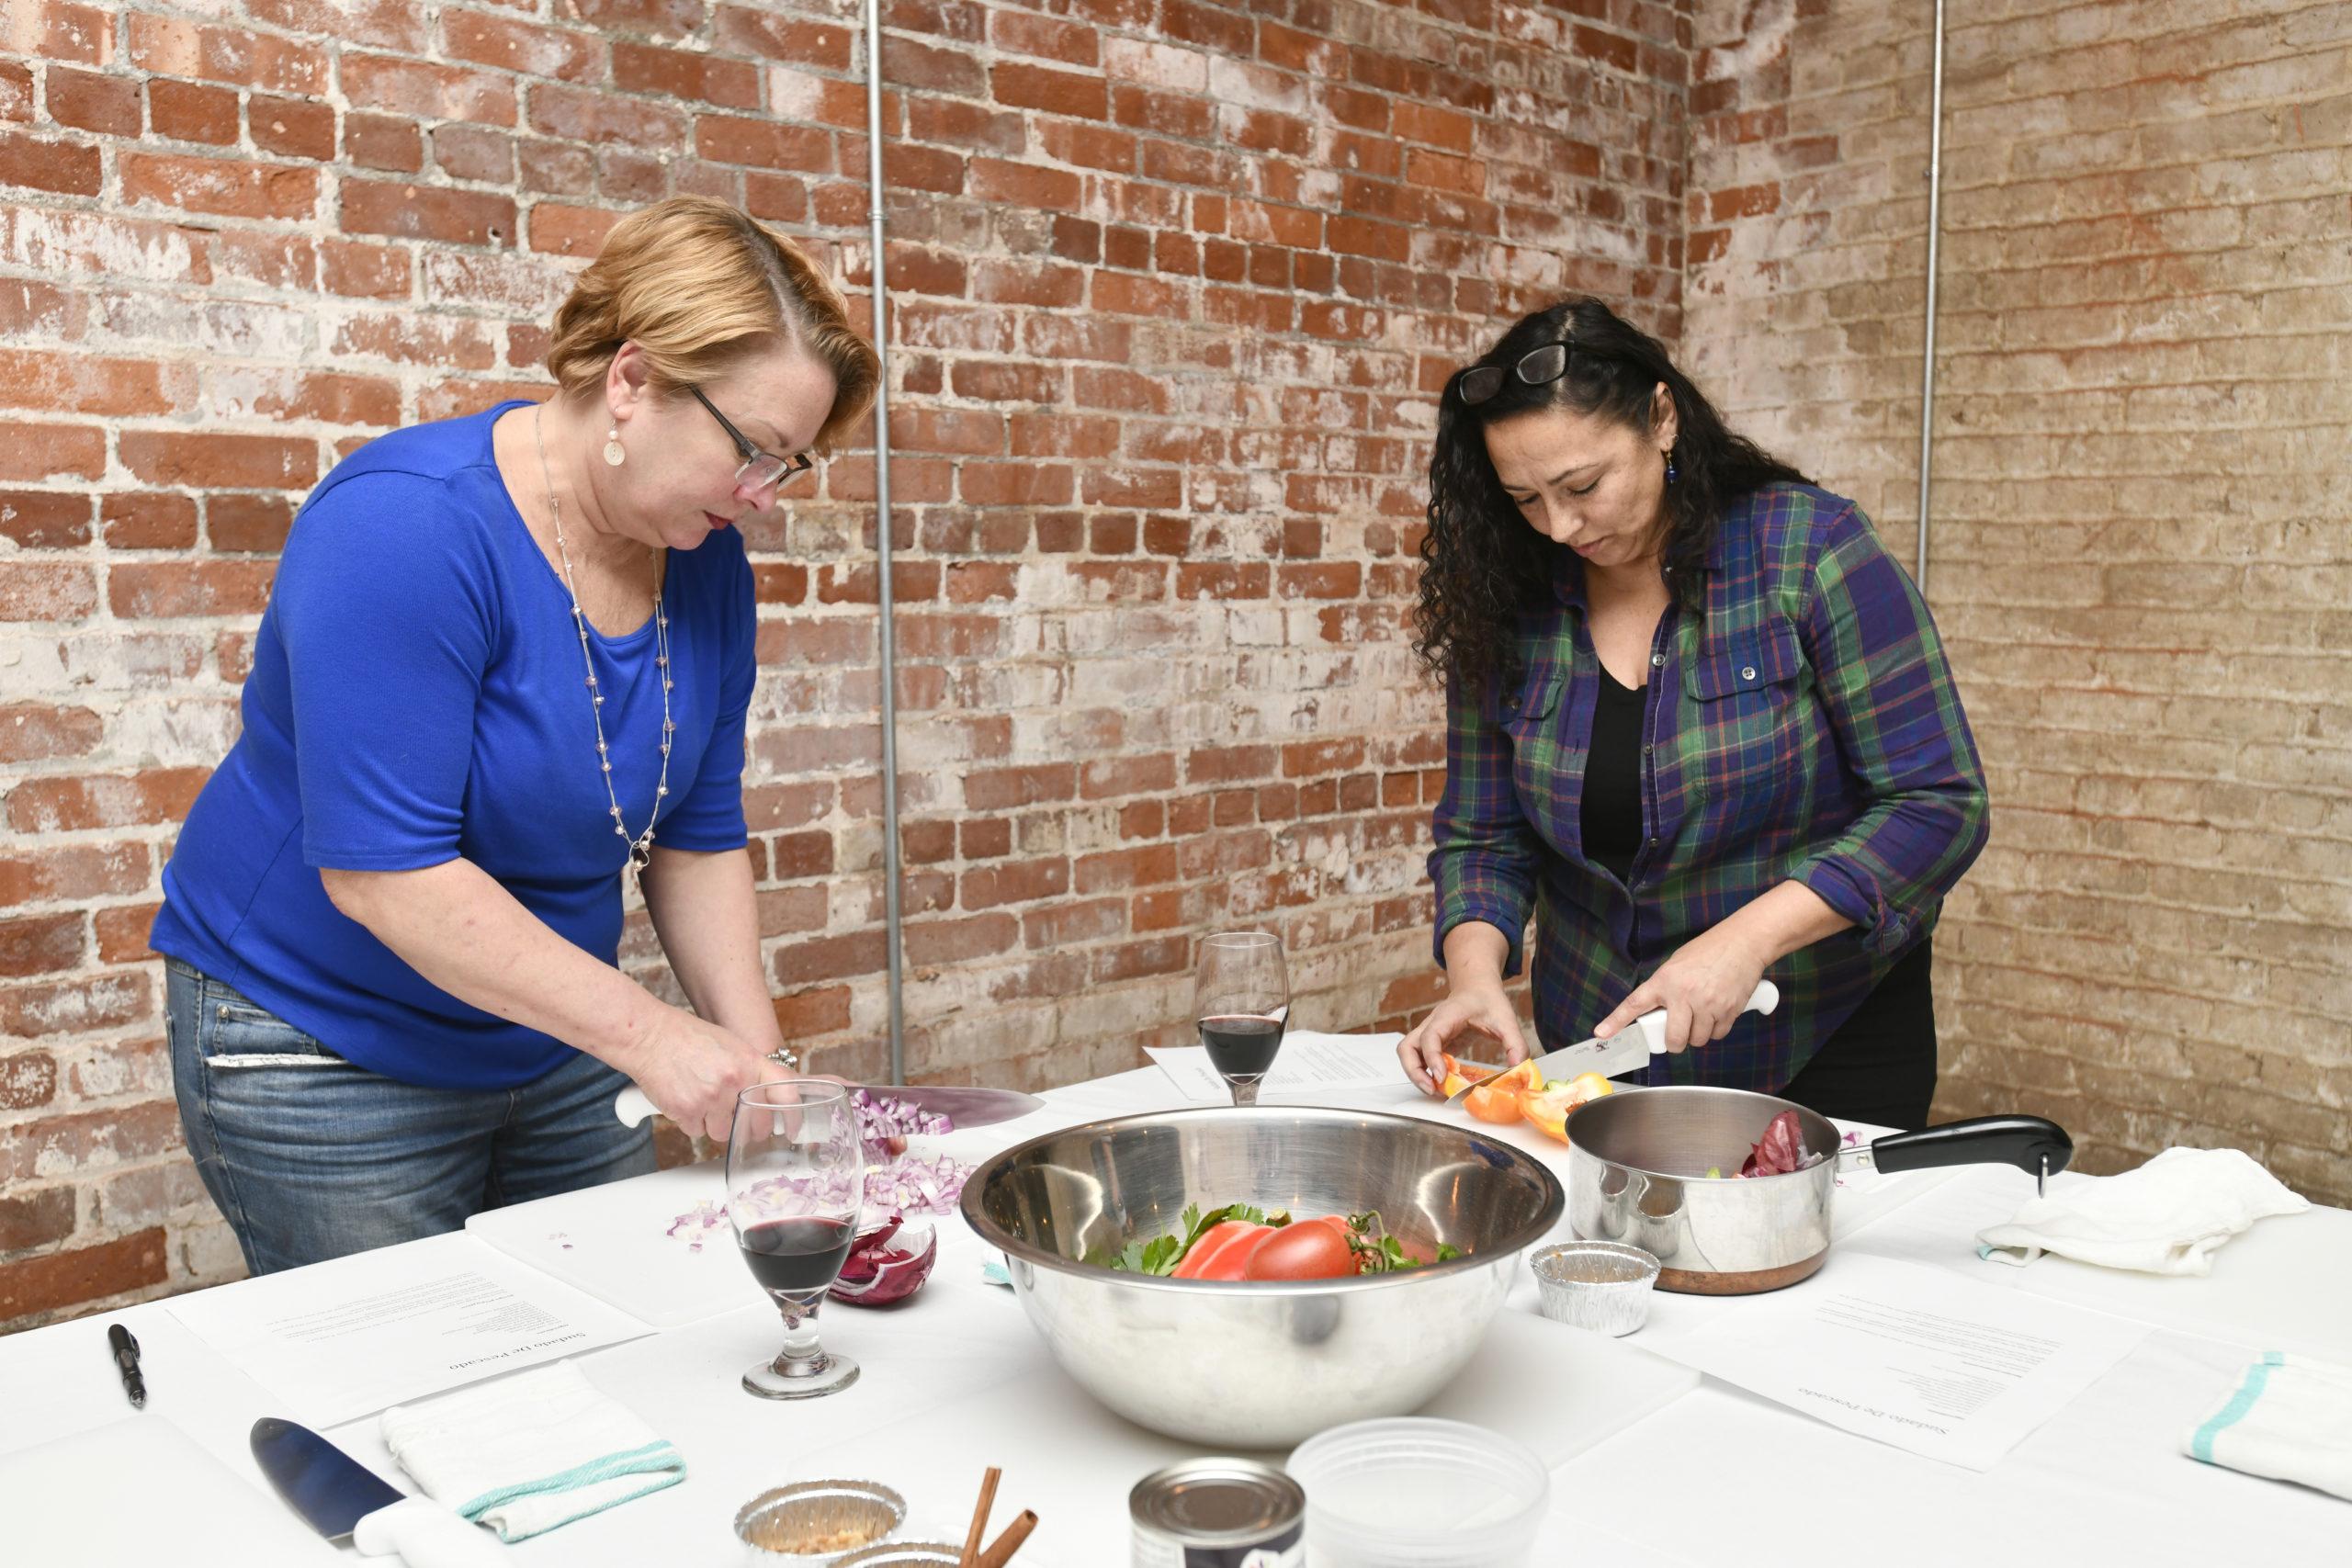 Students Lisa Westfall and Marilyn Cruz chop vegetables.